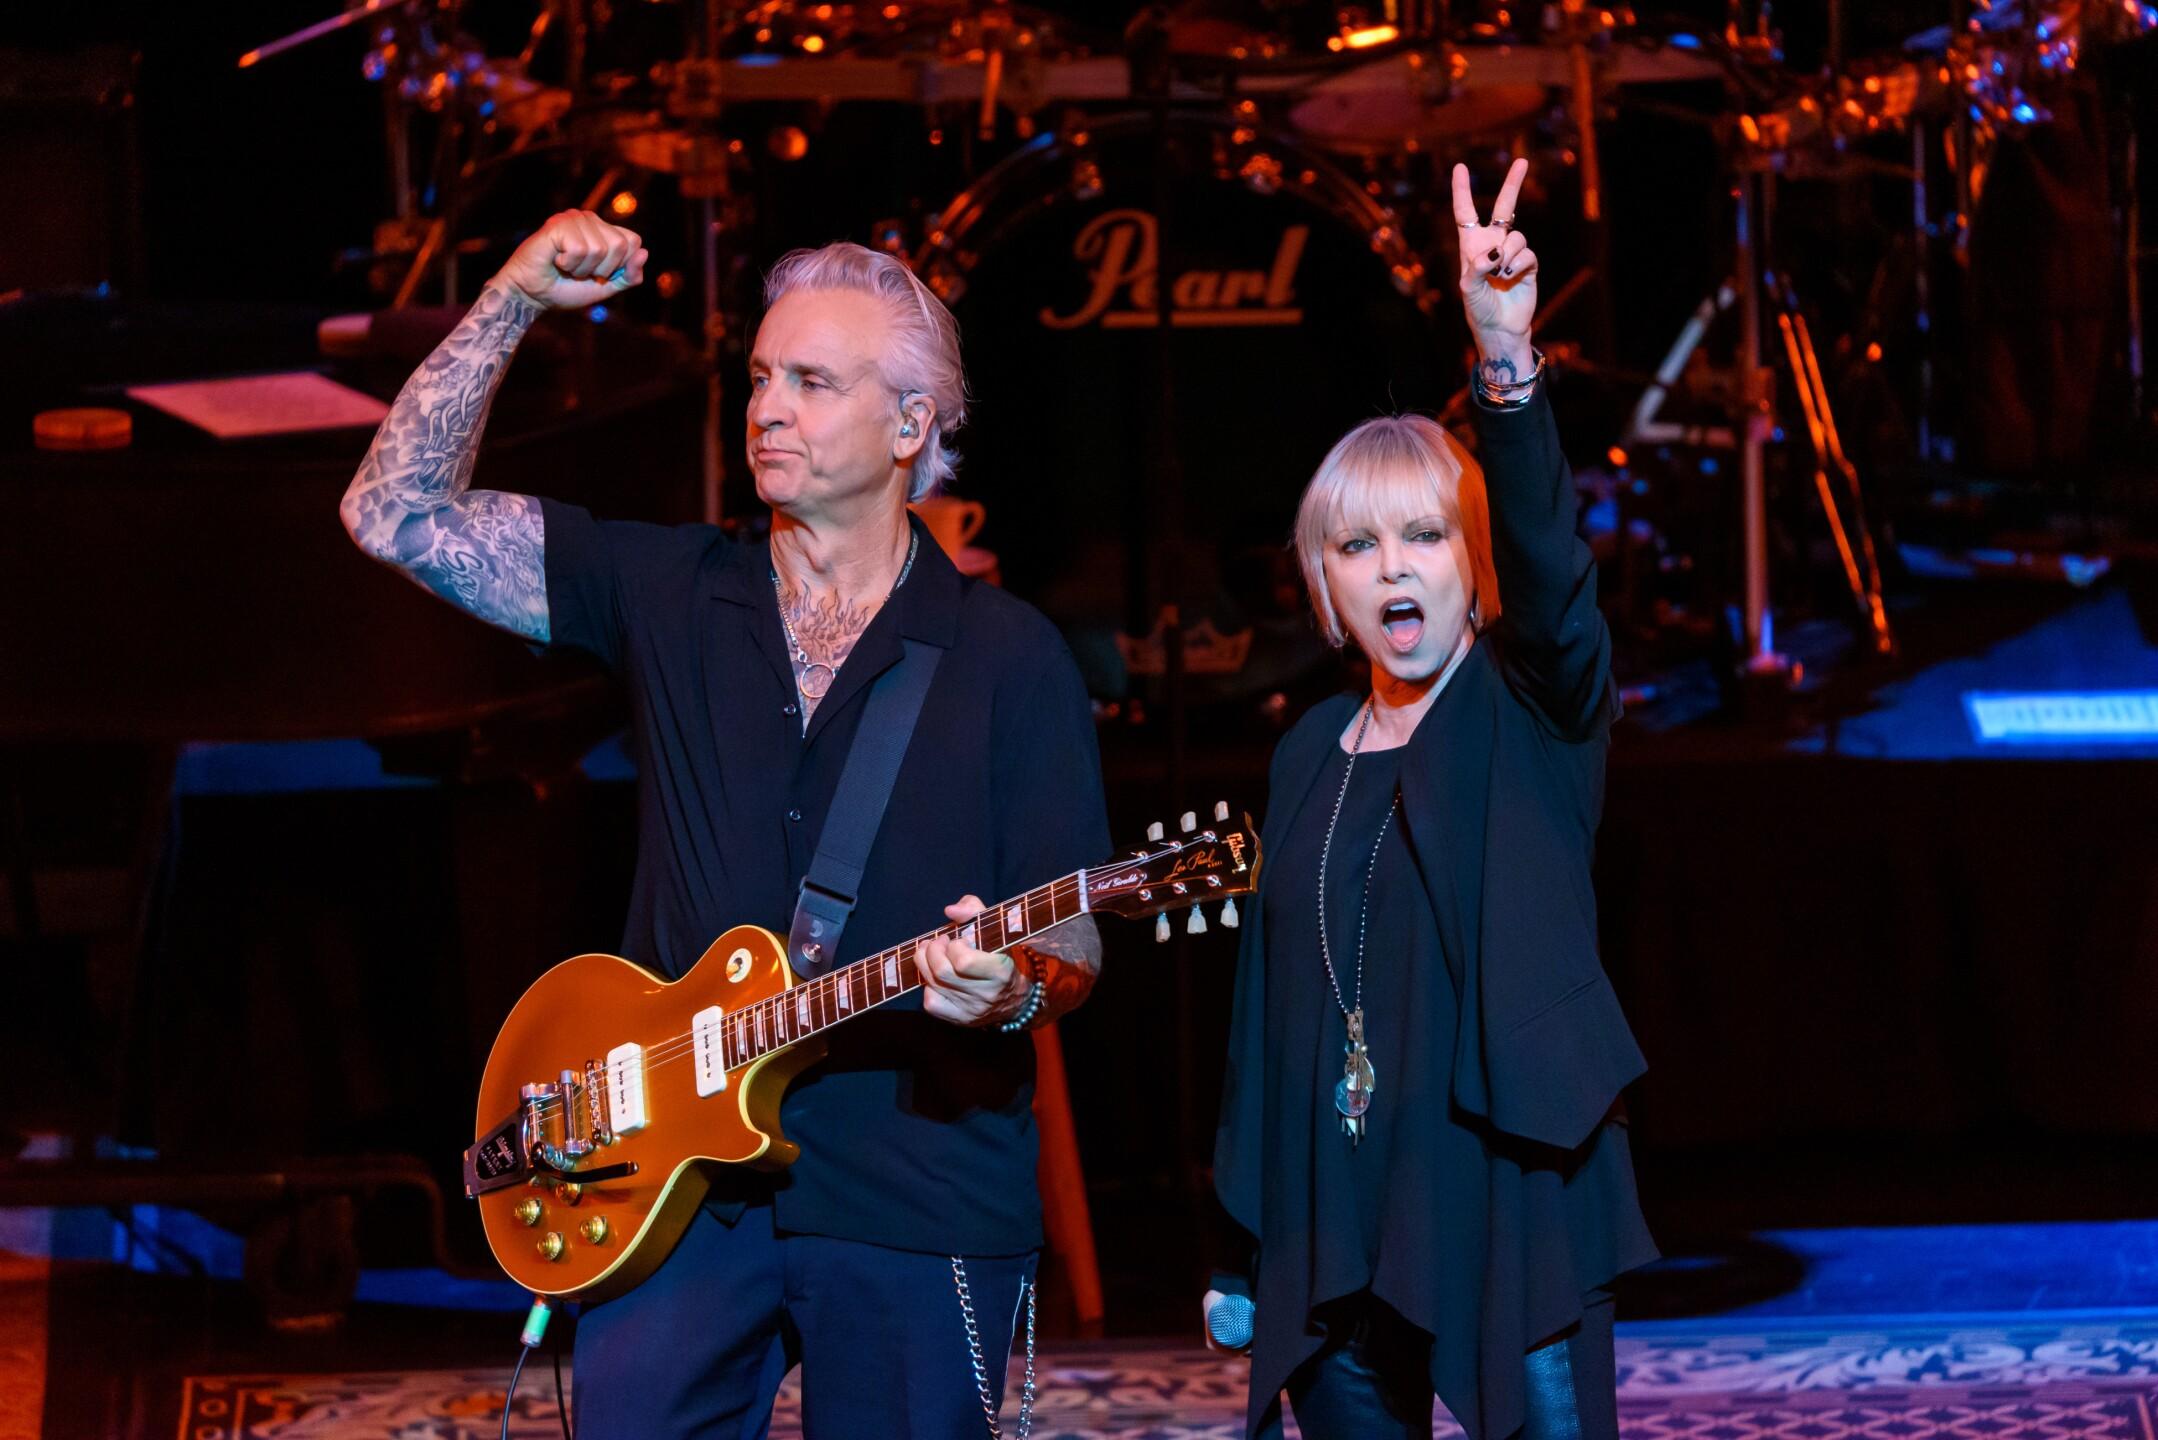 Pat Benatar & Neil Giraldo Make Wynn Las Vegas Debut with 40th Anniversary Tour at the Encore Theater 8.2.19_Credit Patrick Gray (3).jpg